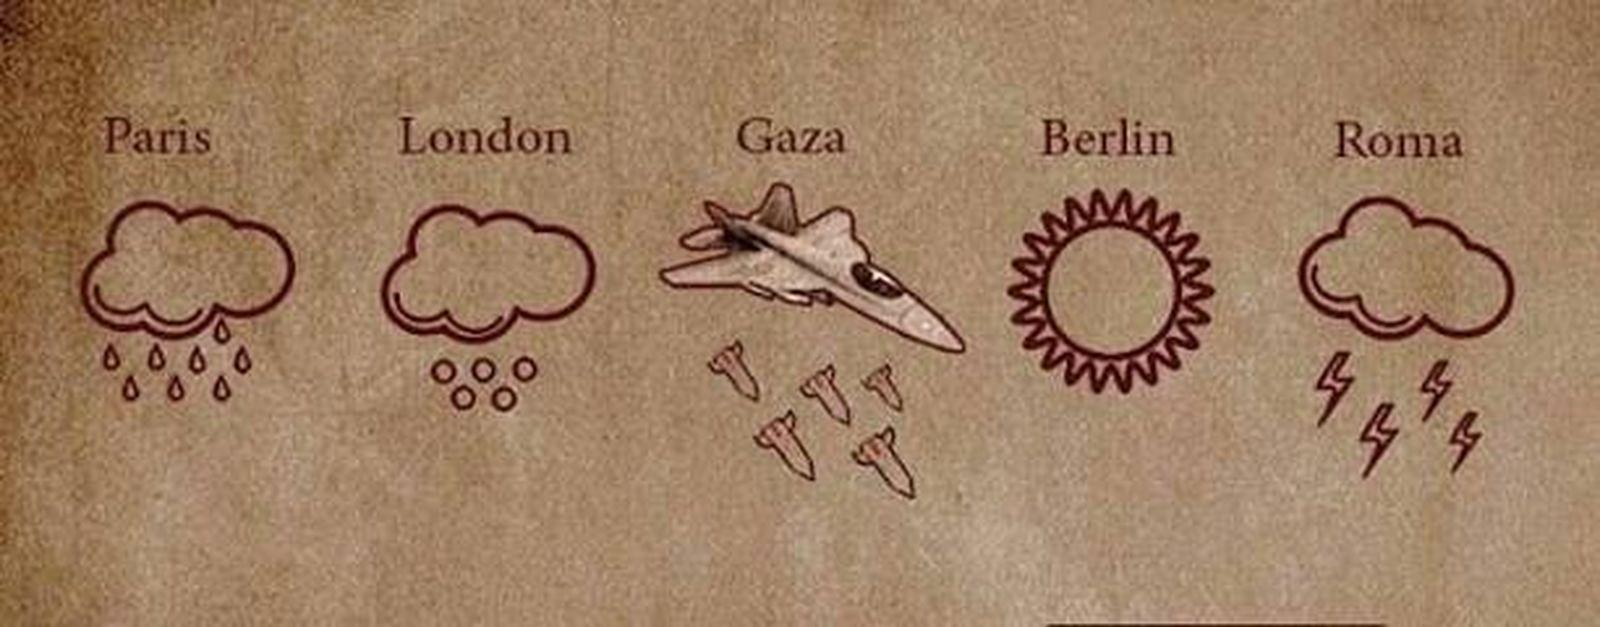 Gazze 🕌🕌